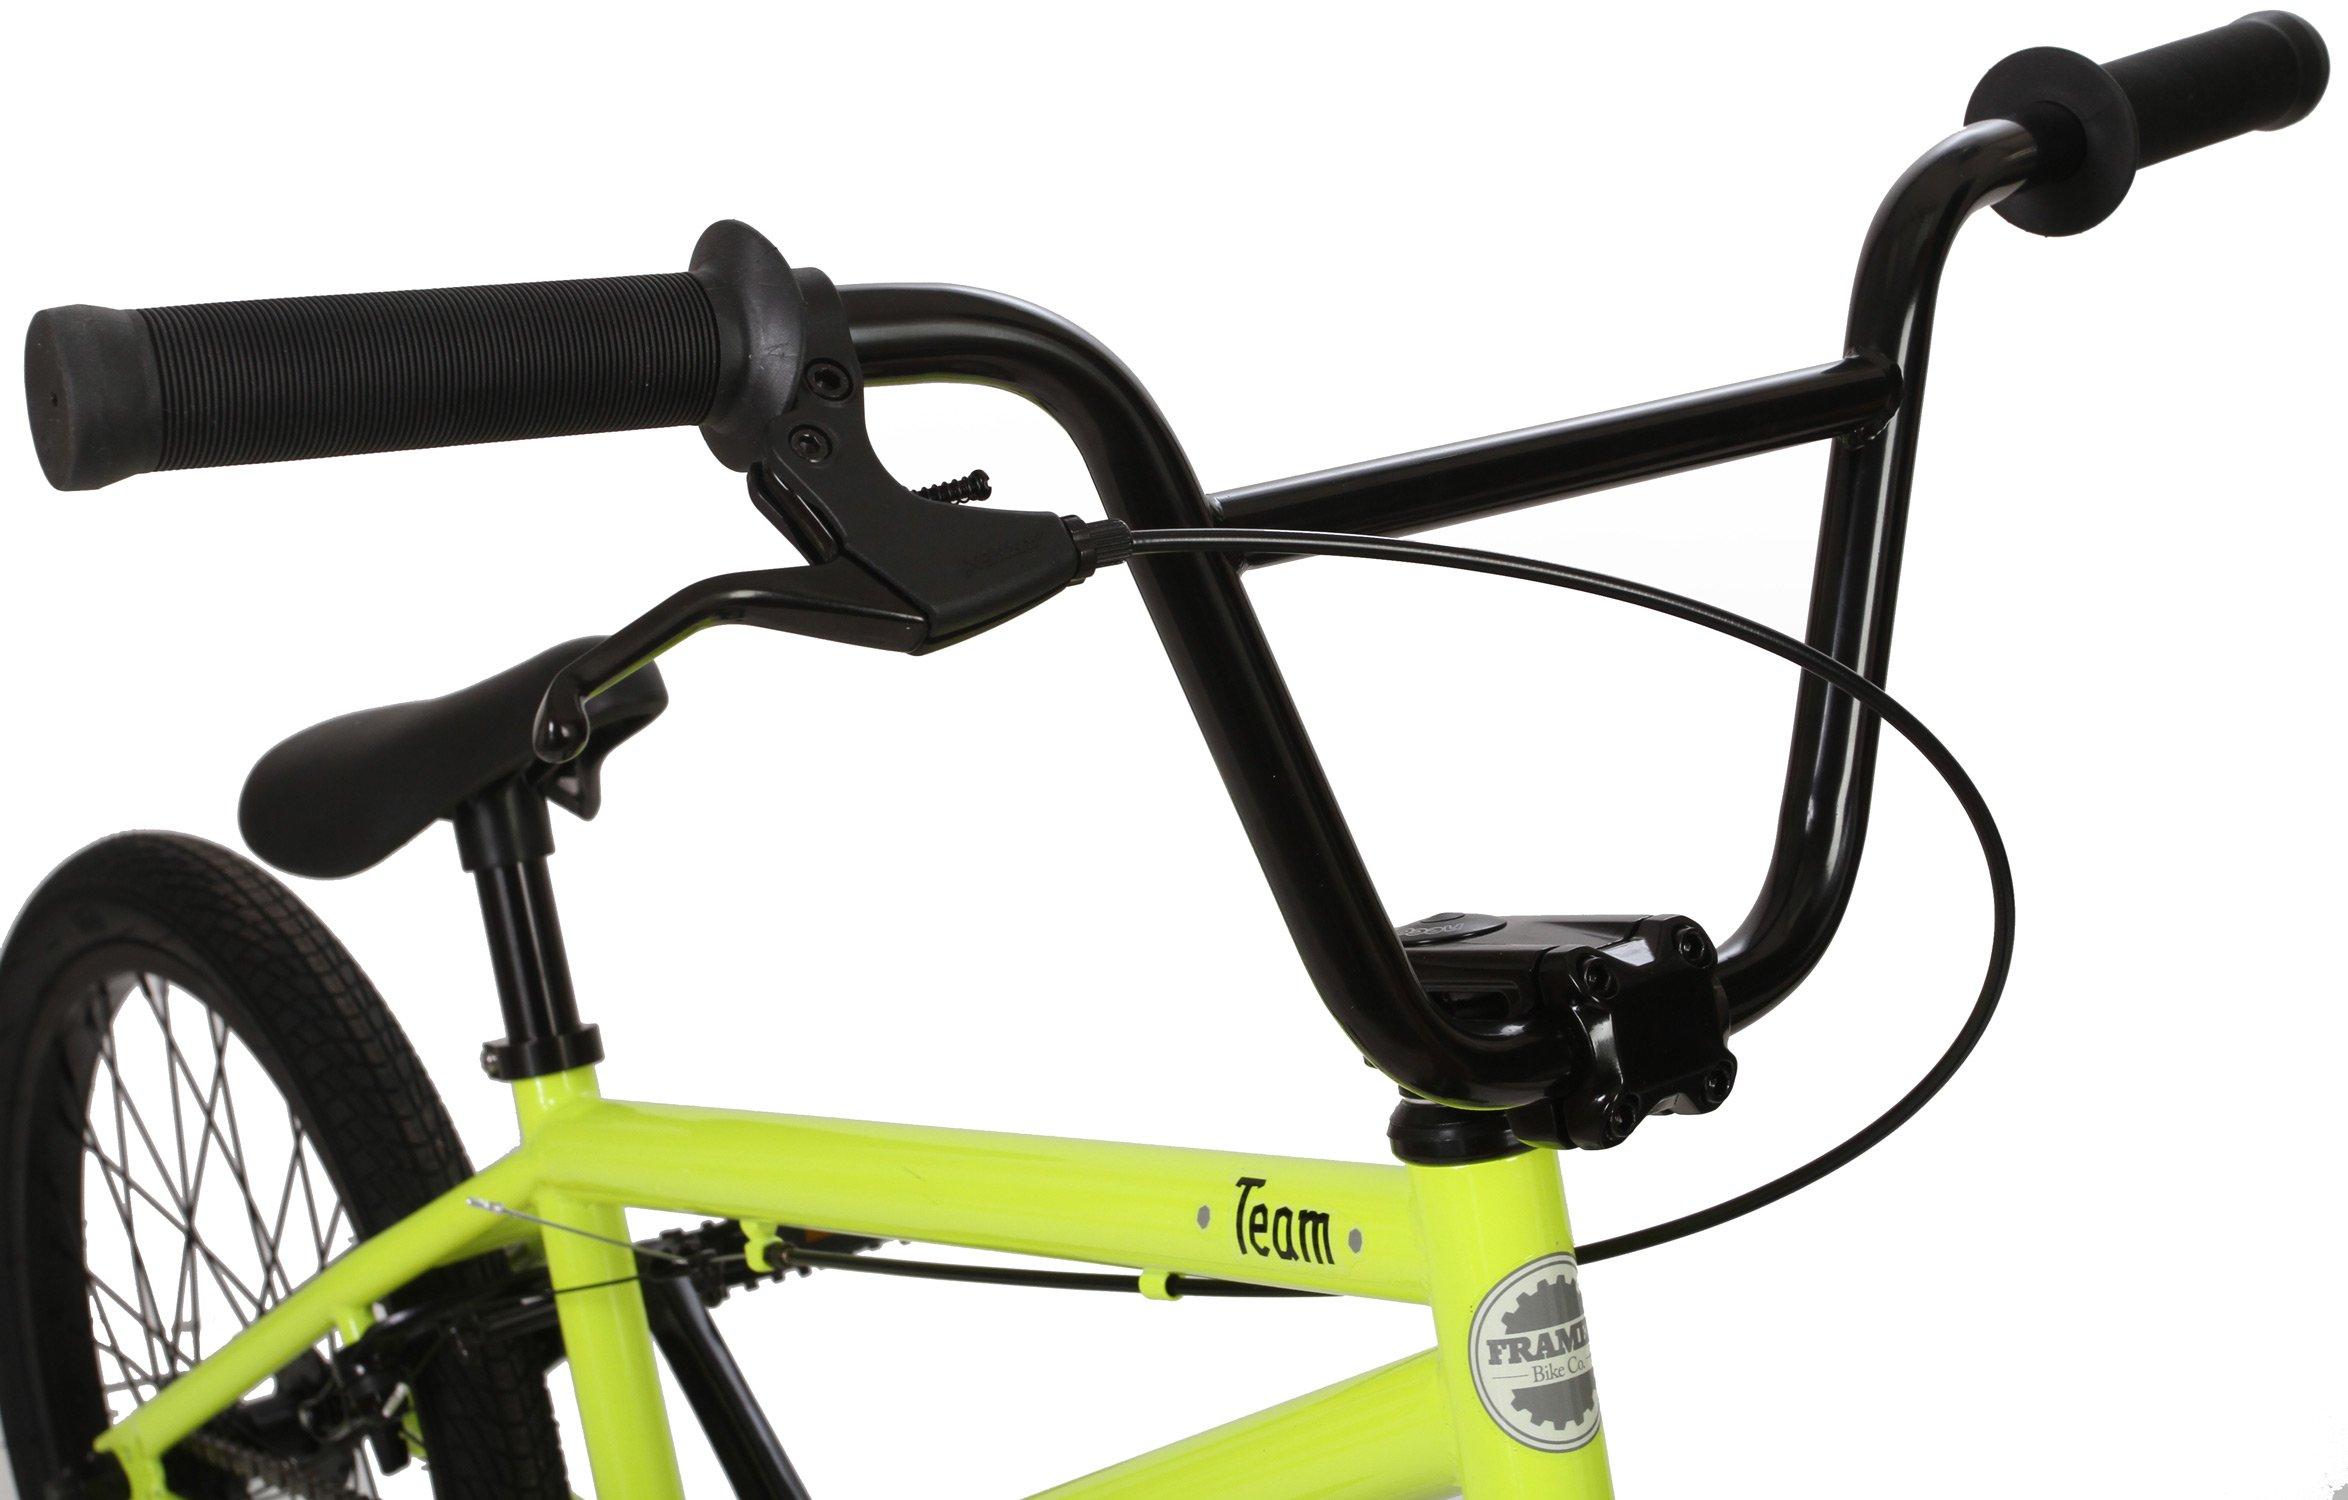 Framed Team BMX Bike Sz 20in by Framed (Image #3)